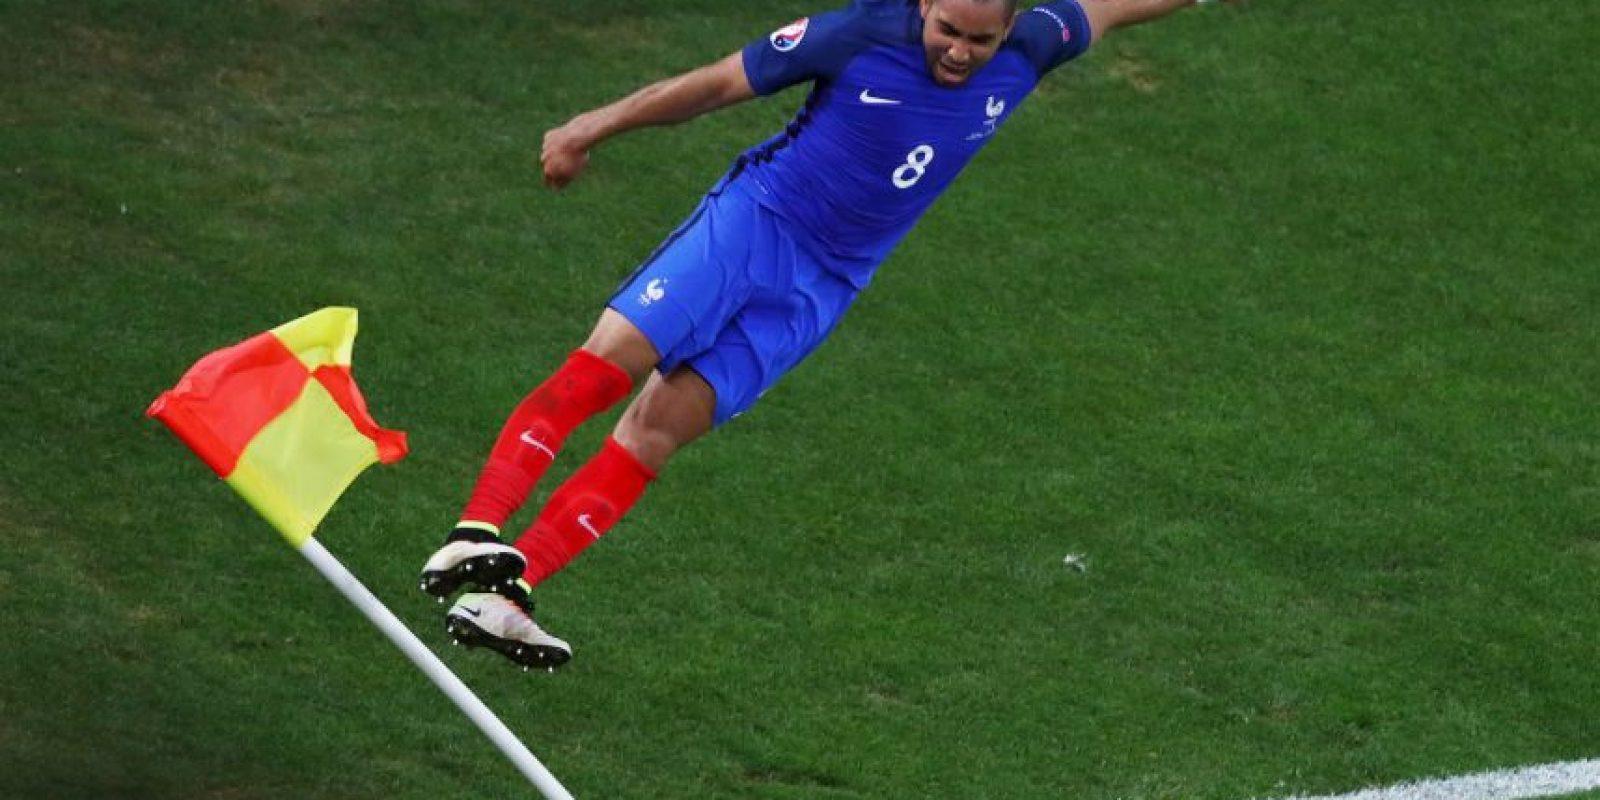 Francia espera derribar a Irlanda en los octavos de final Foto:Getty Images